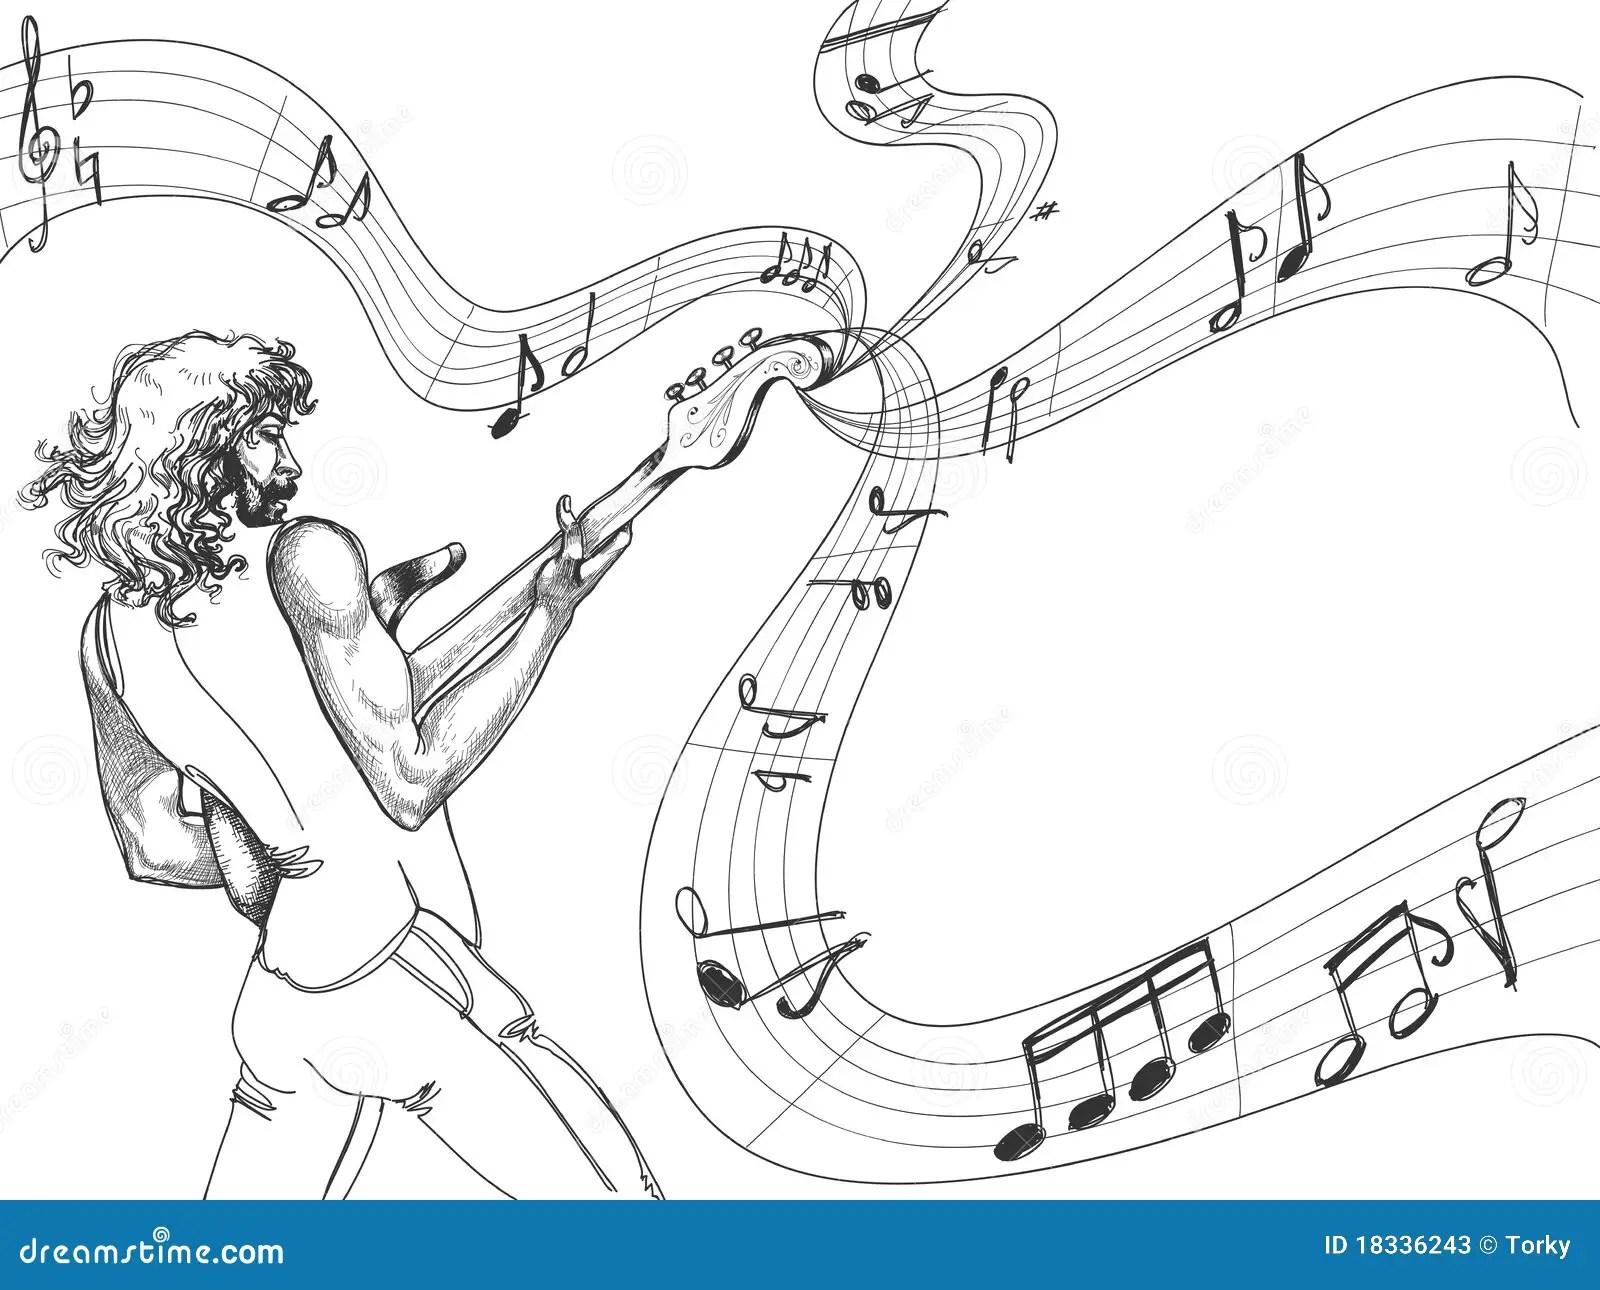 The Guitar Player Sketch Stock Photos